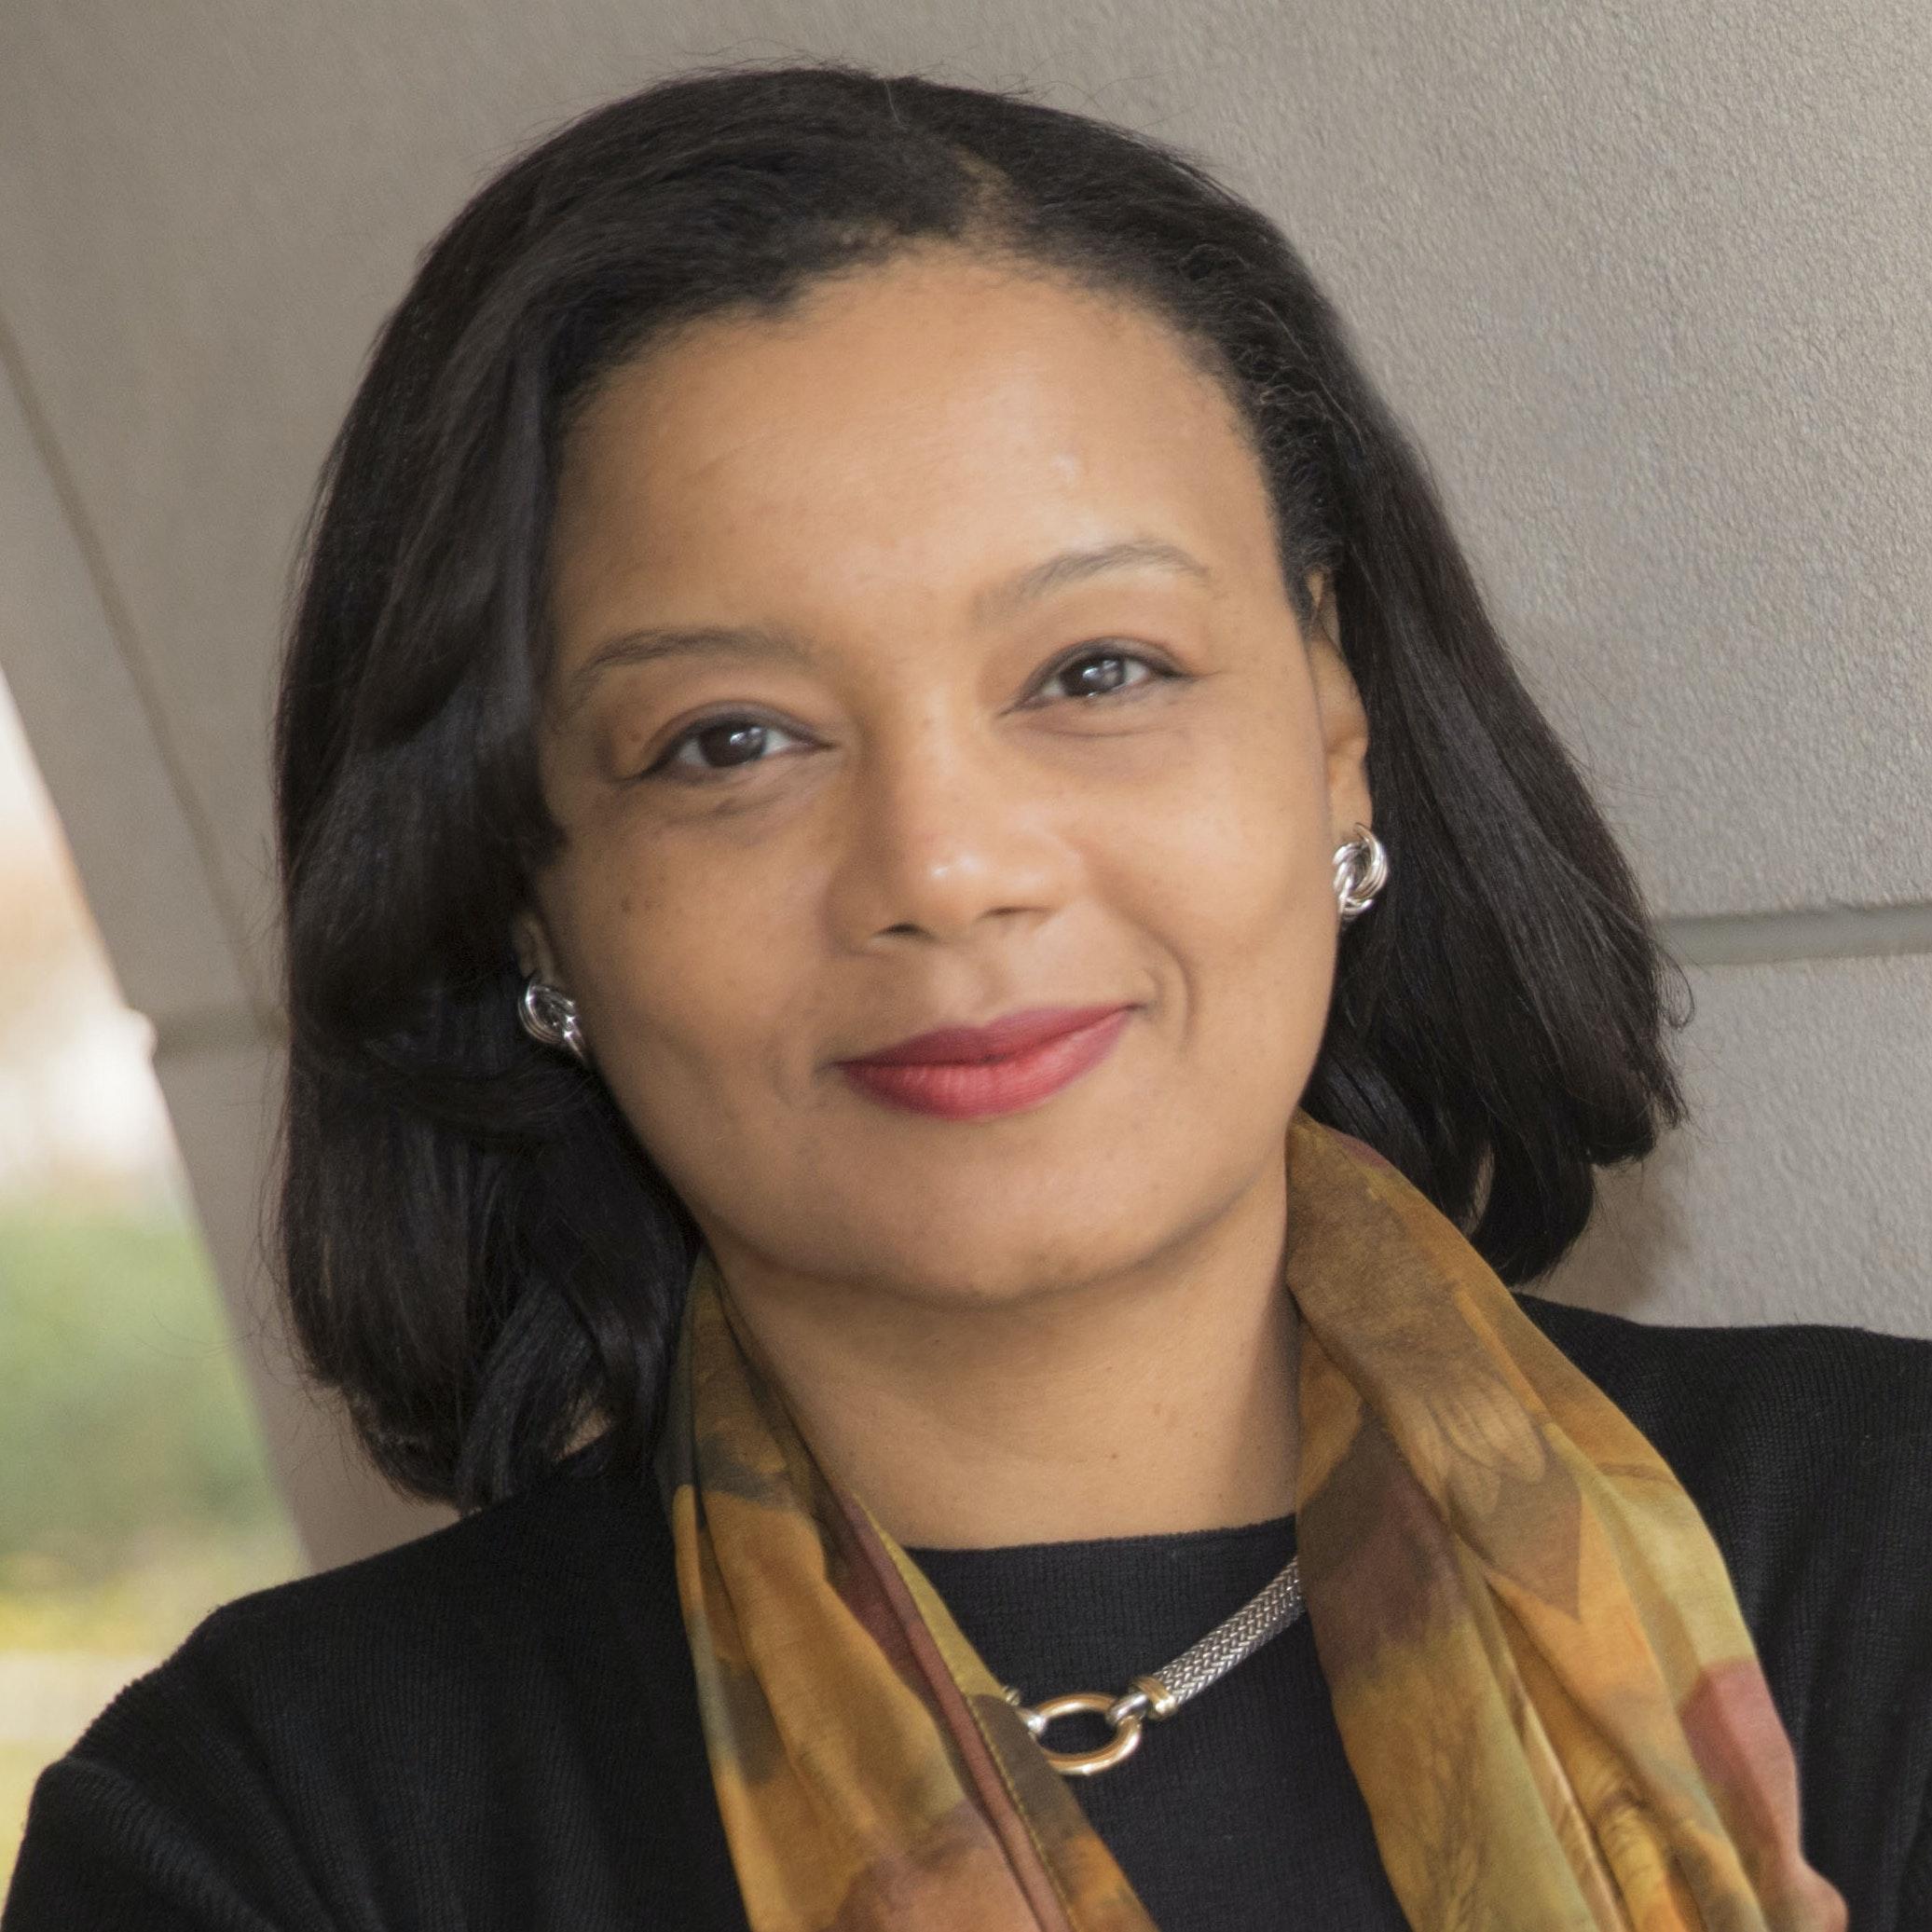 Portrait of Tomiko Brown-Nagin